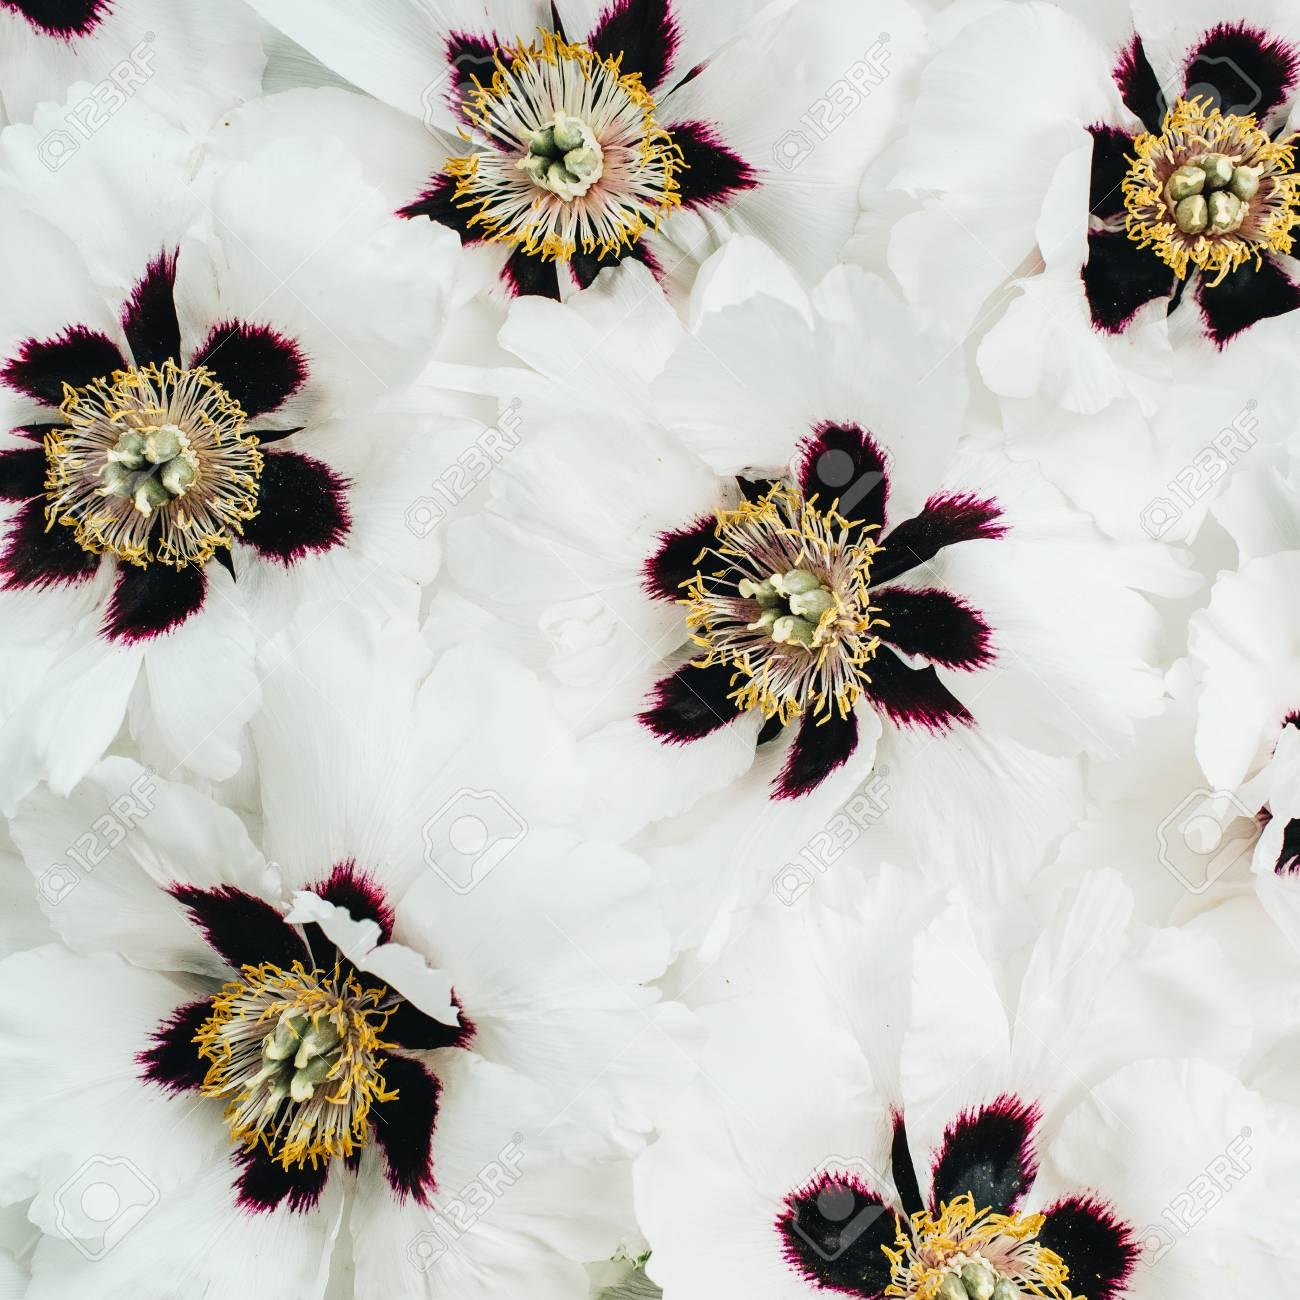 White Peonies Flowers Texture Flat Lay Top View Fotos Retratos